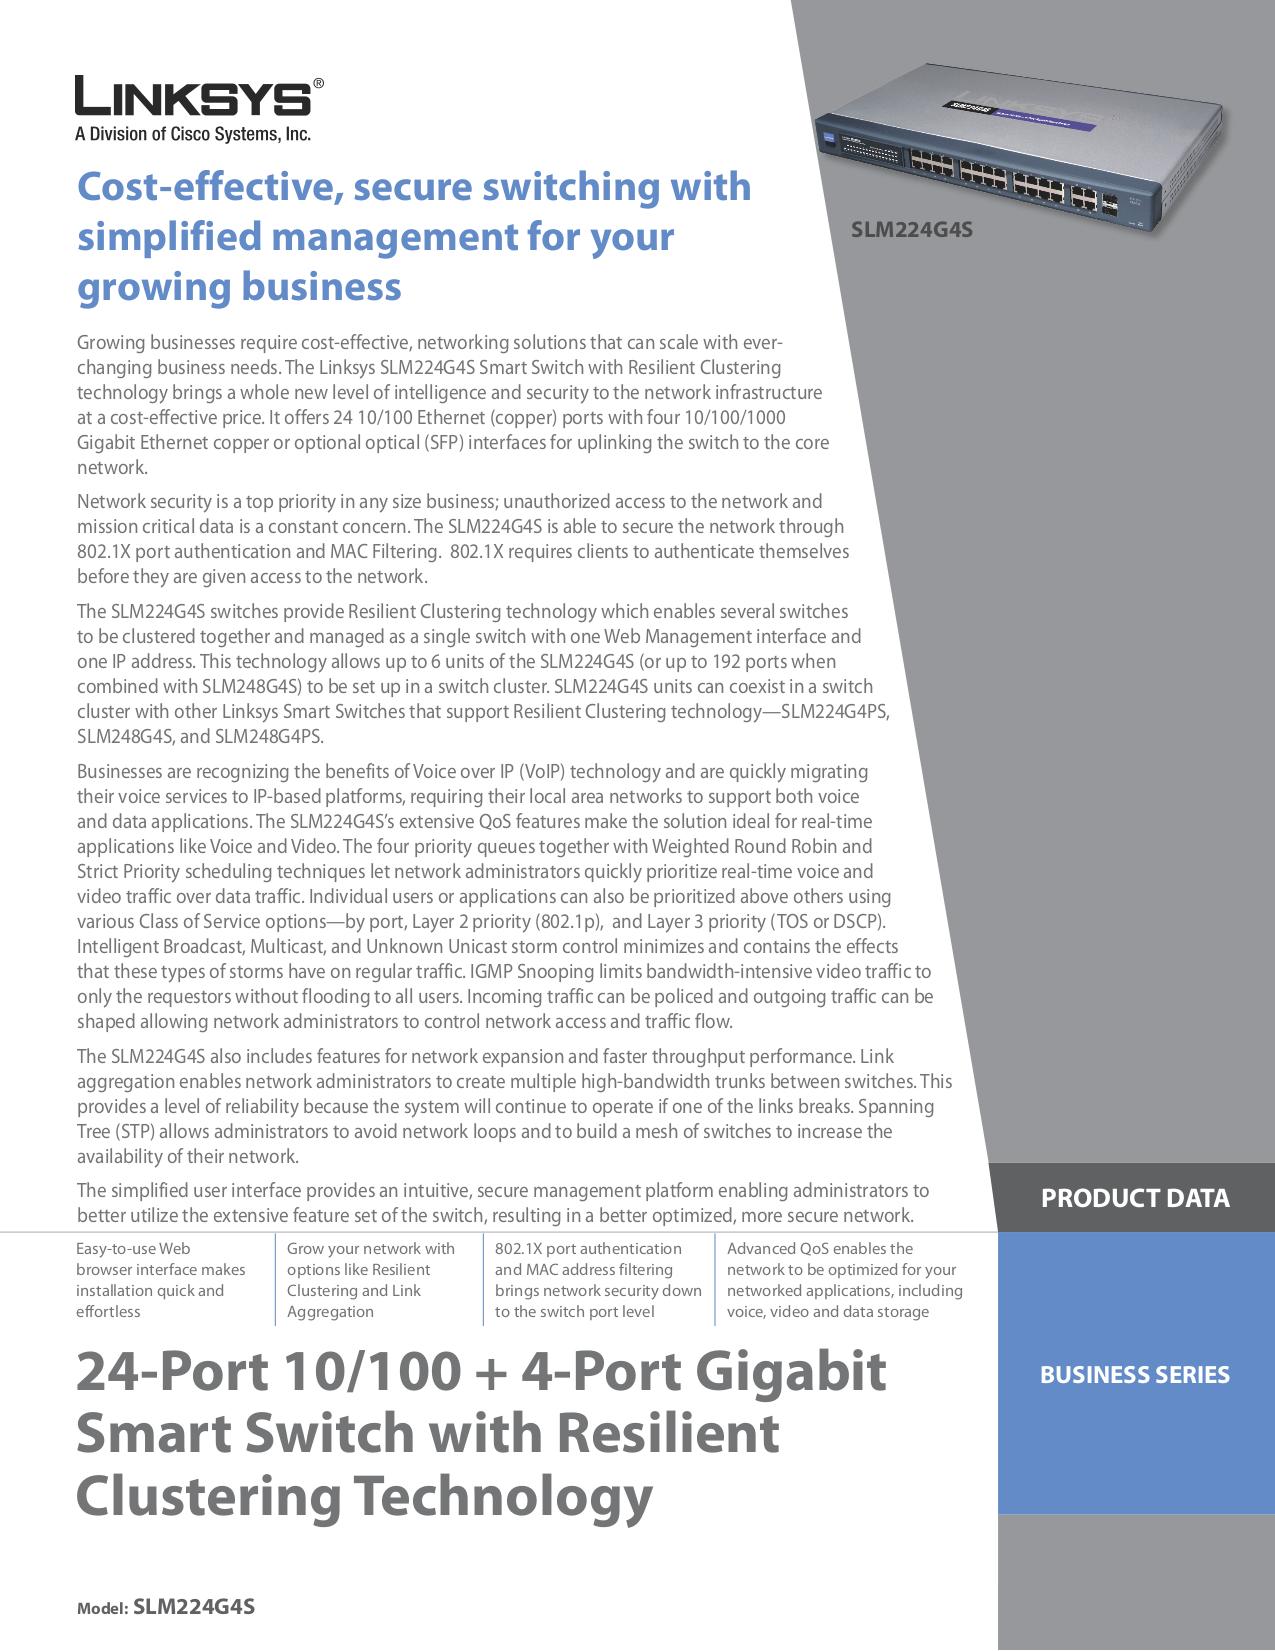 pdf for Linksys Switch SLM224G4S manual